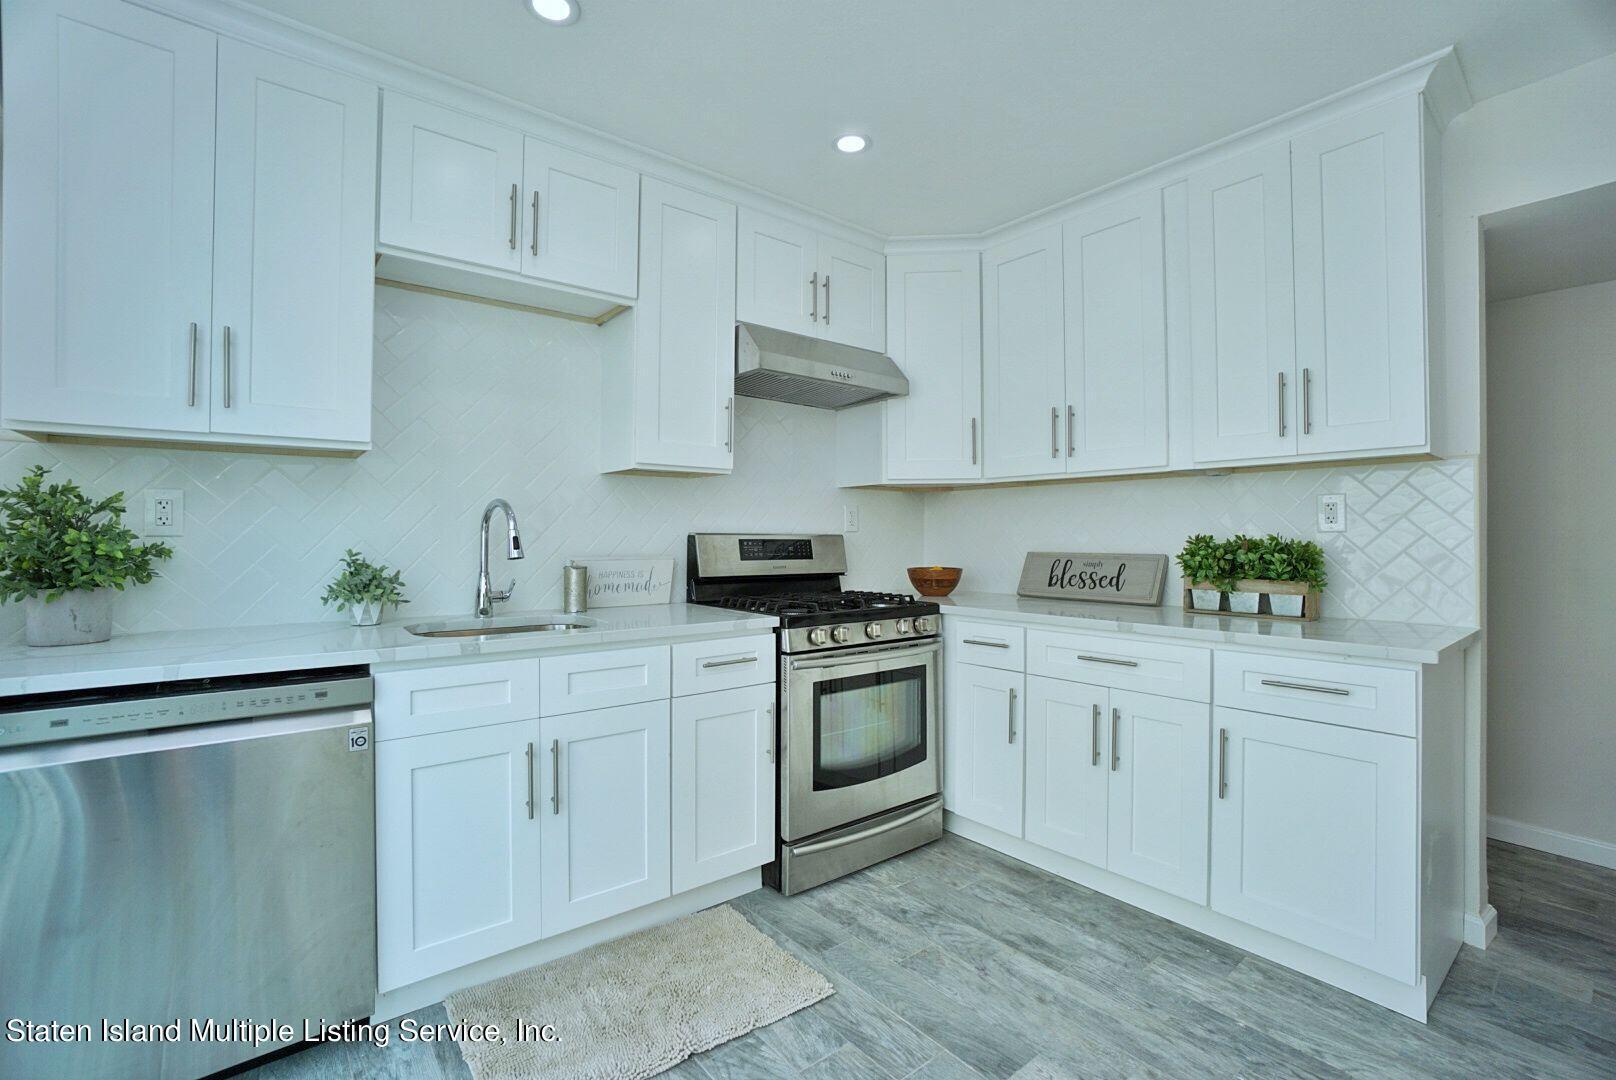 Single Family - Detached 83 Boylan Street  Staten Island, NY 10312, MLS-1149266-9